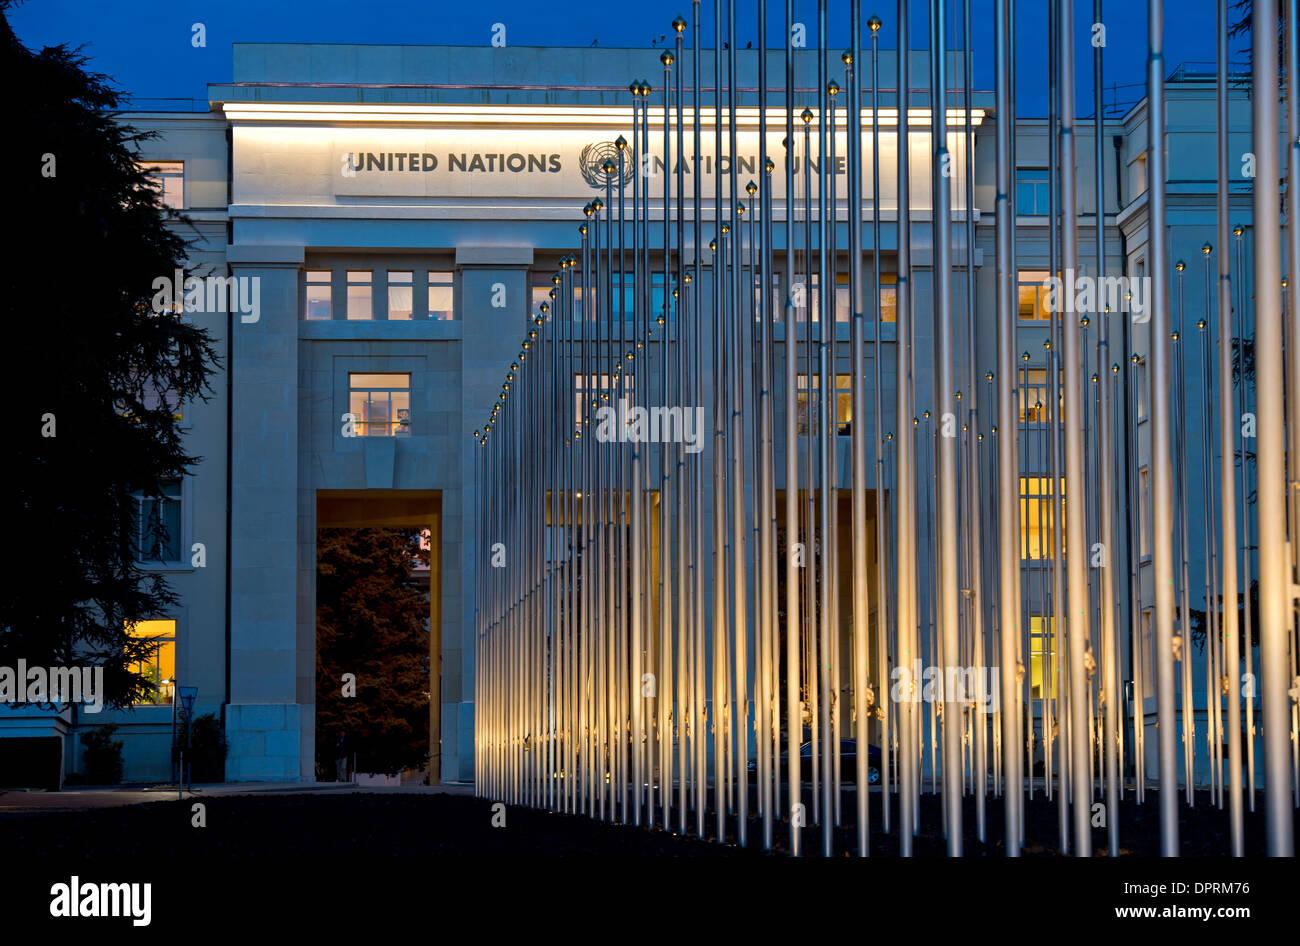 Night shot of the Palais des Nations, European headquarters of the United Nations, Geneva, Switzerland - Stock Image